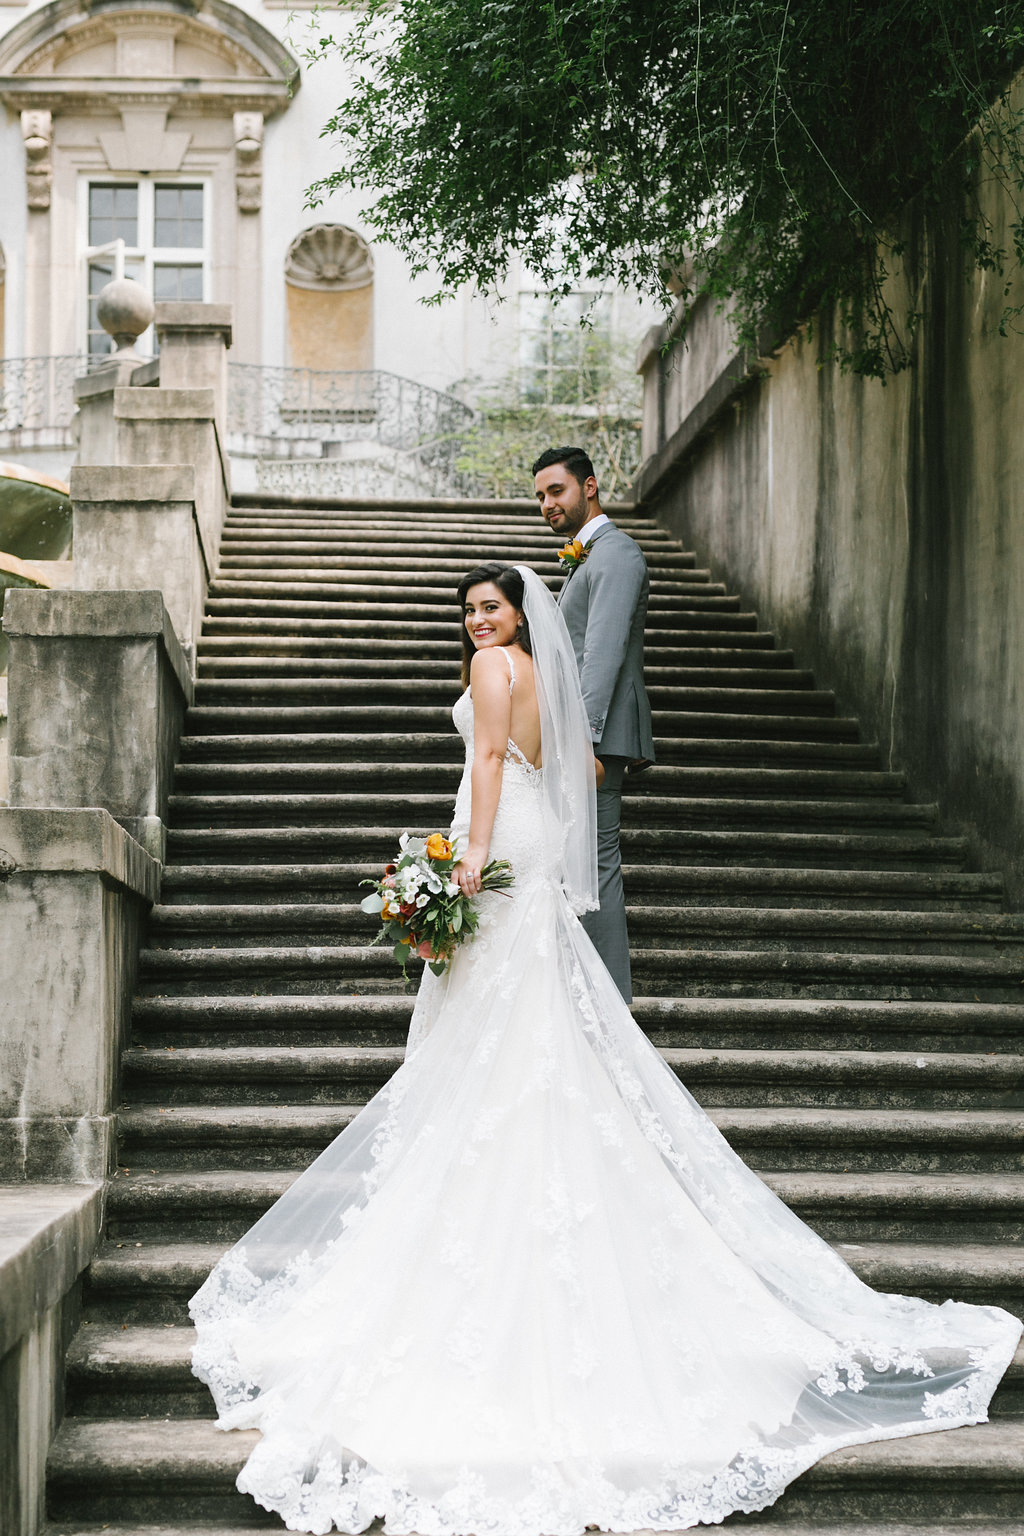 Vibrant Atlanta Wedding Inspiration with Rust Accents - https://ruffledblog.com/vibrant-atlanta-wedding-inspiration-with-rust-accents